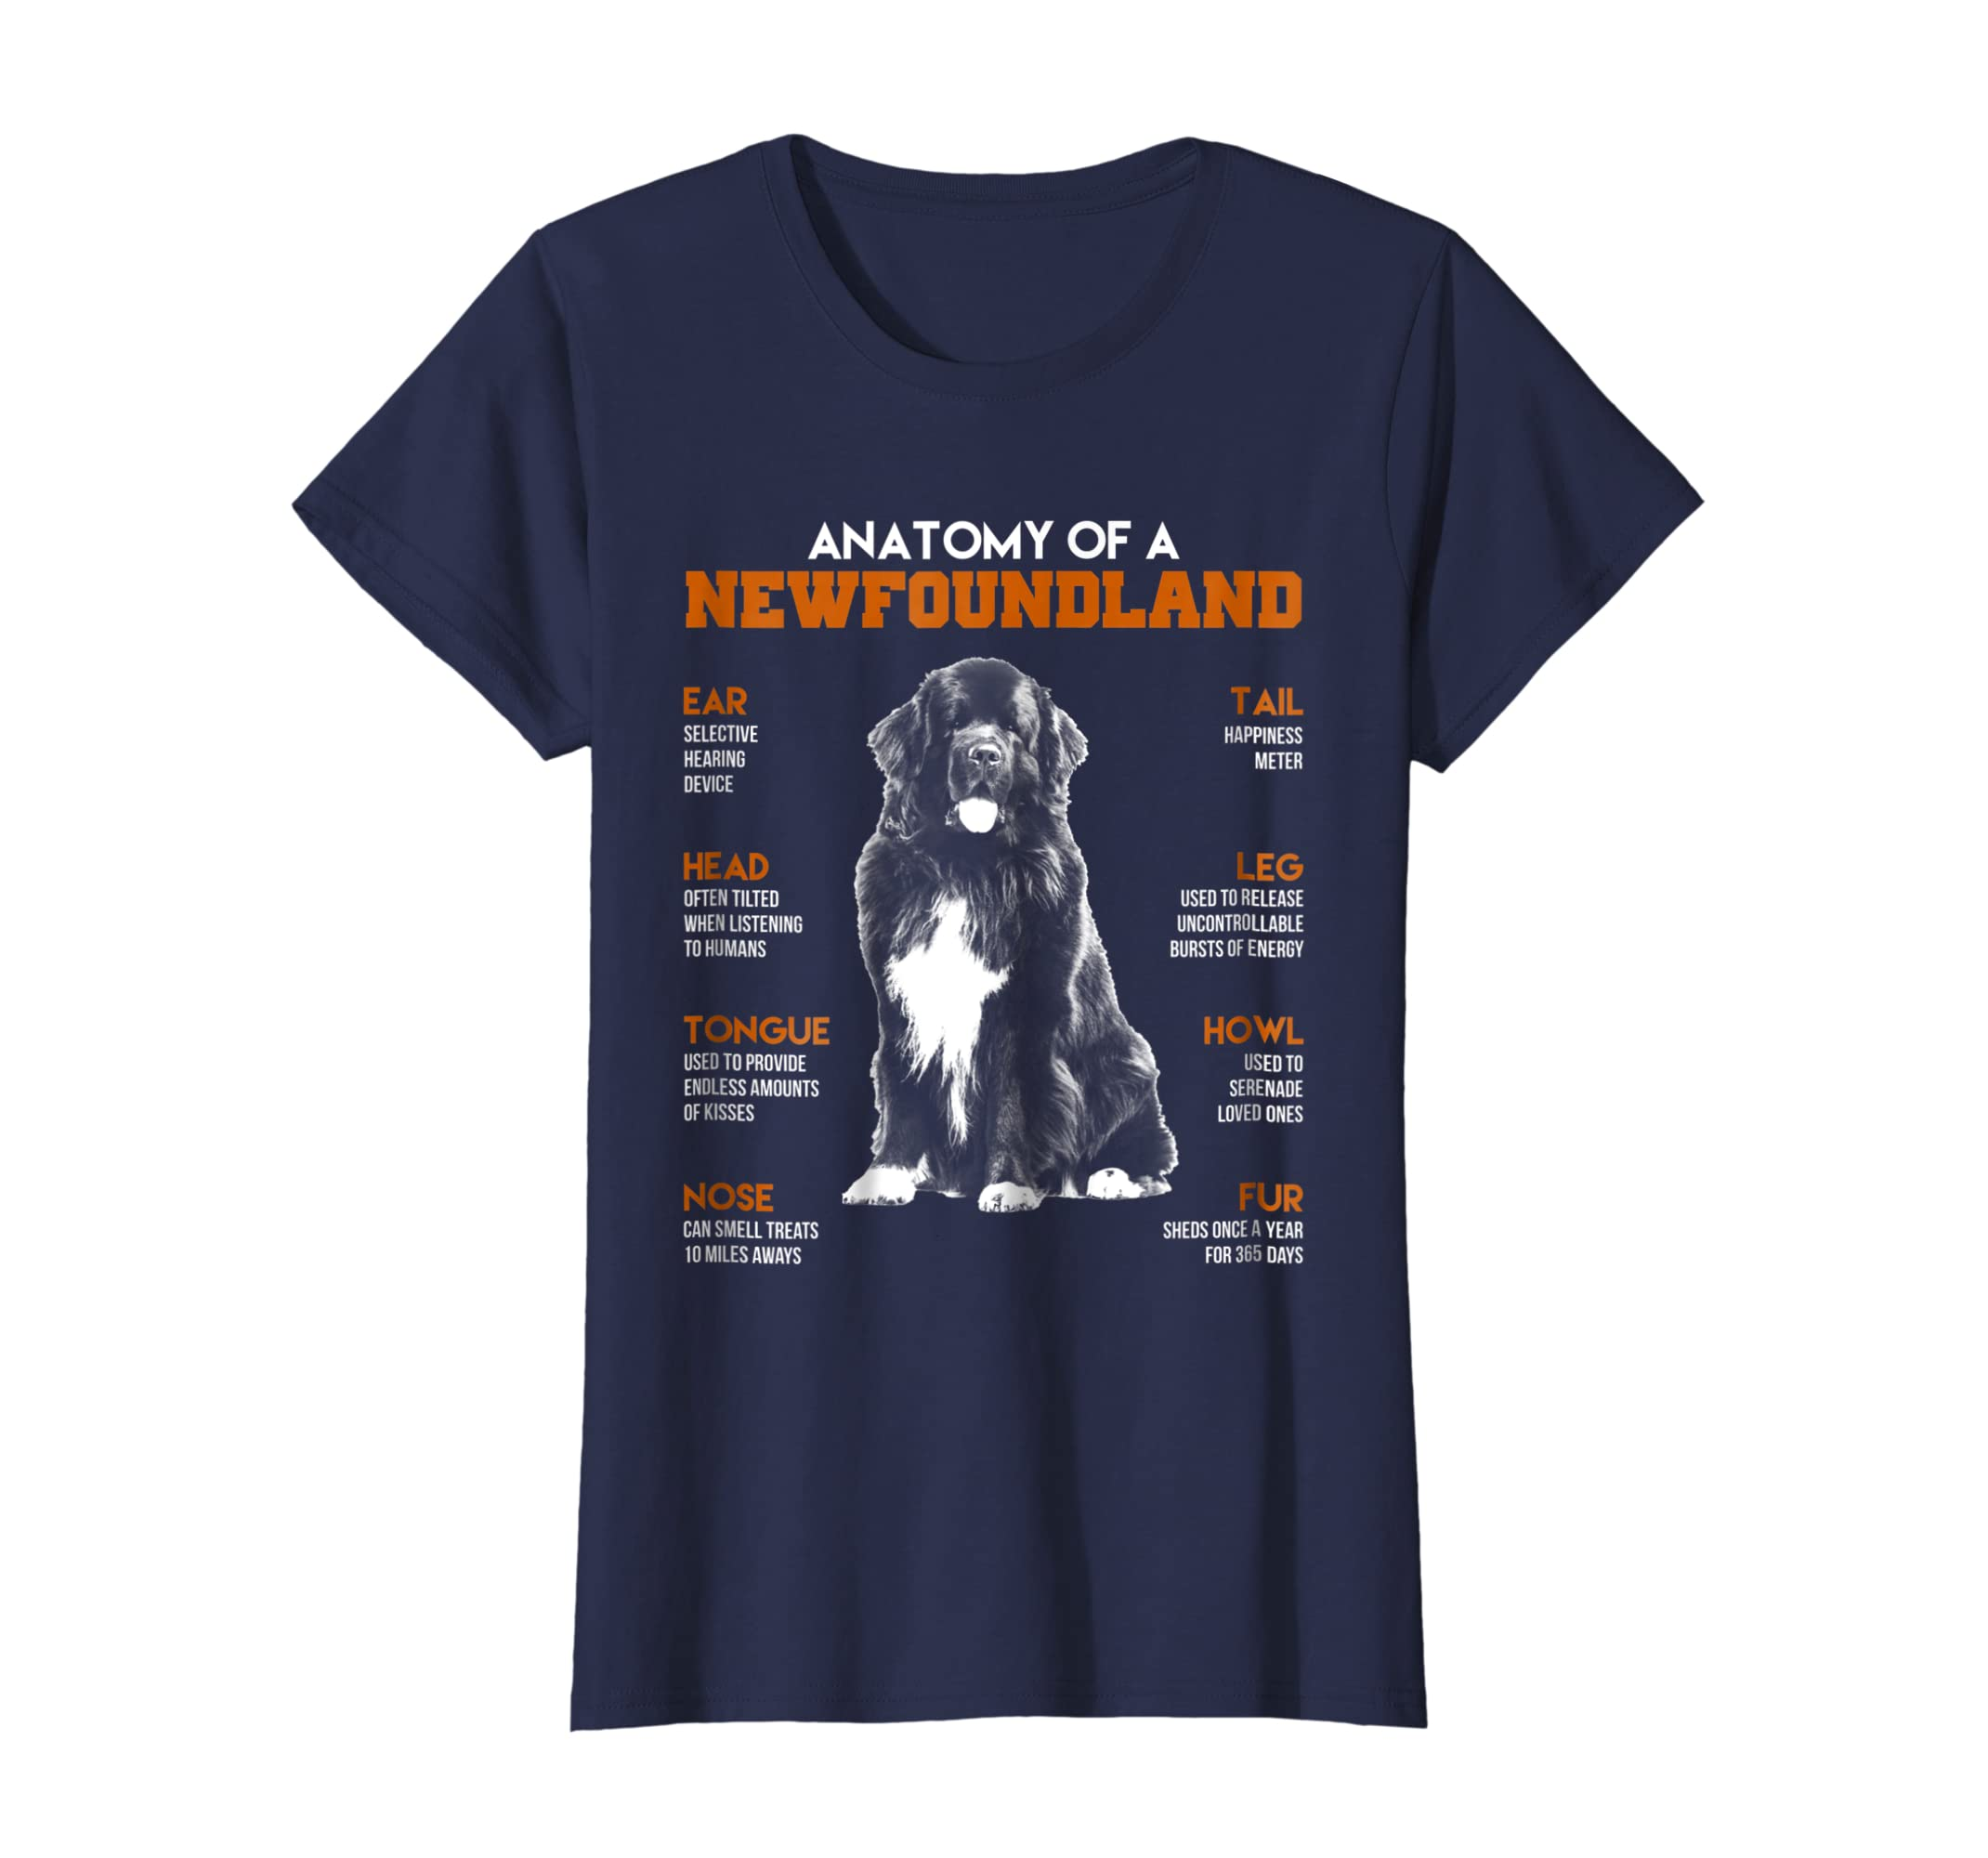 Amazon Anatomy Of A Newfoundland Dogs T Shirt Funny Gift Clothing